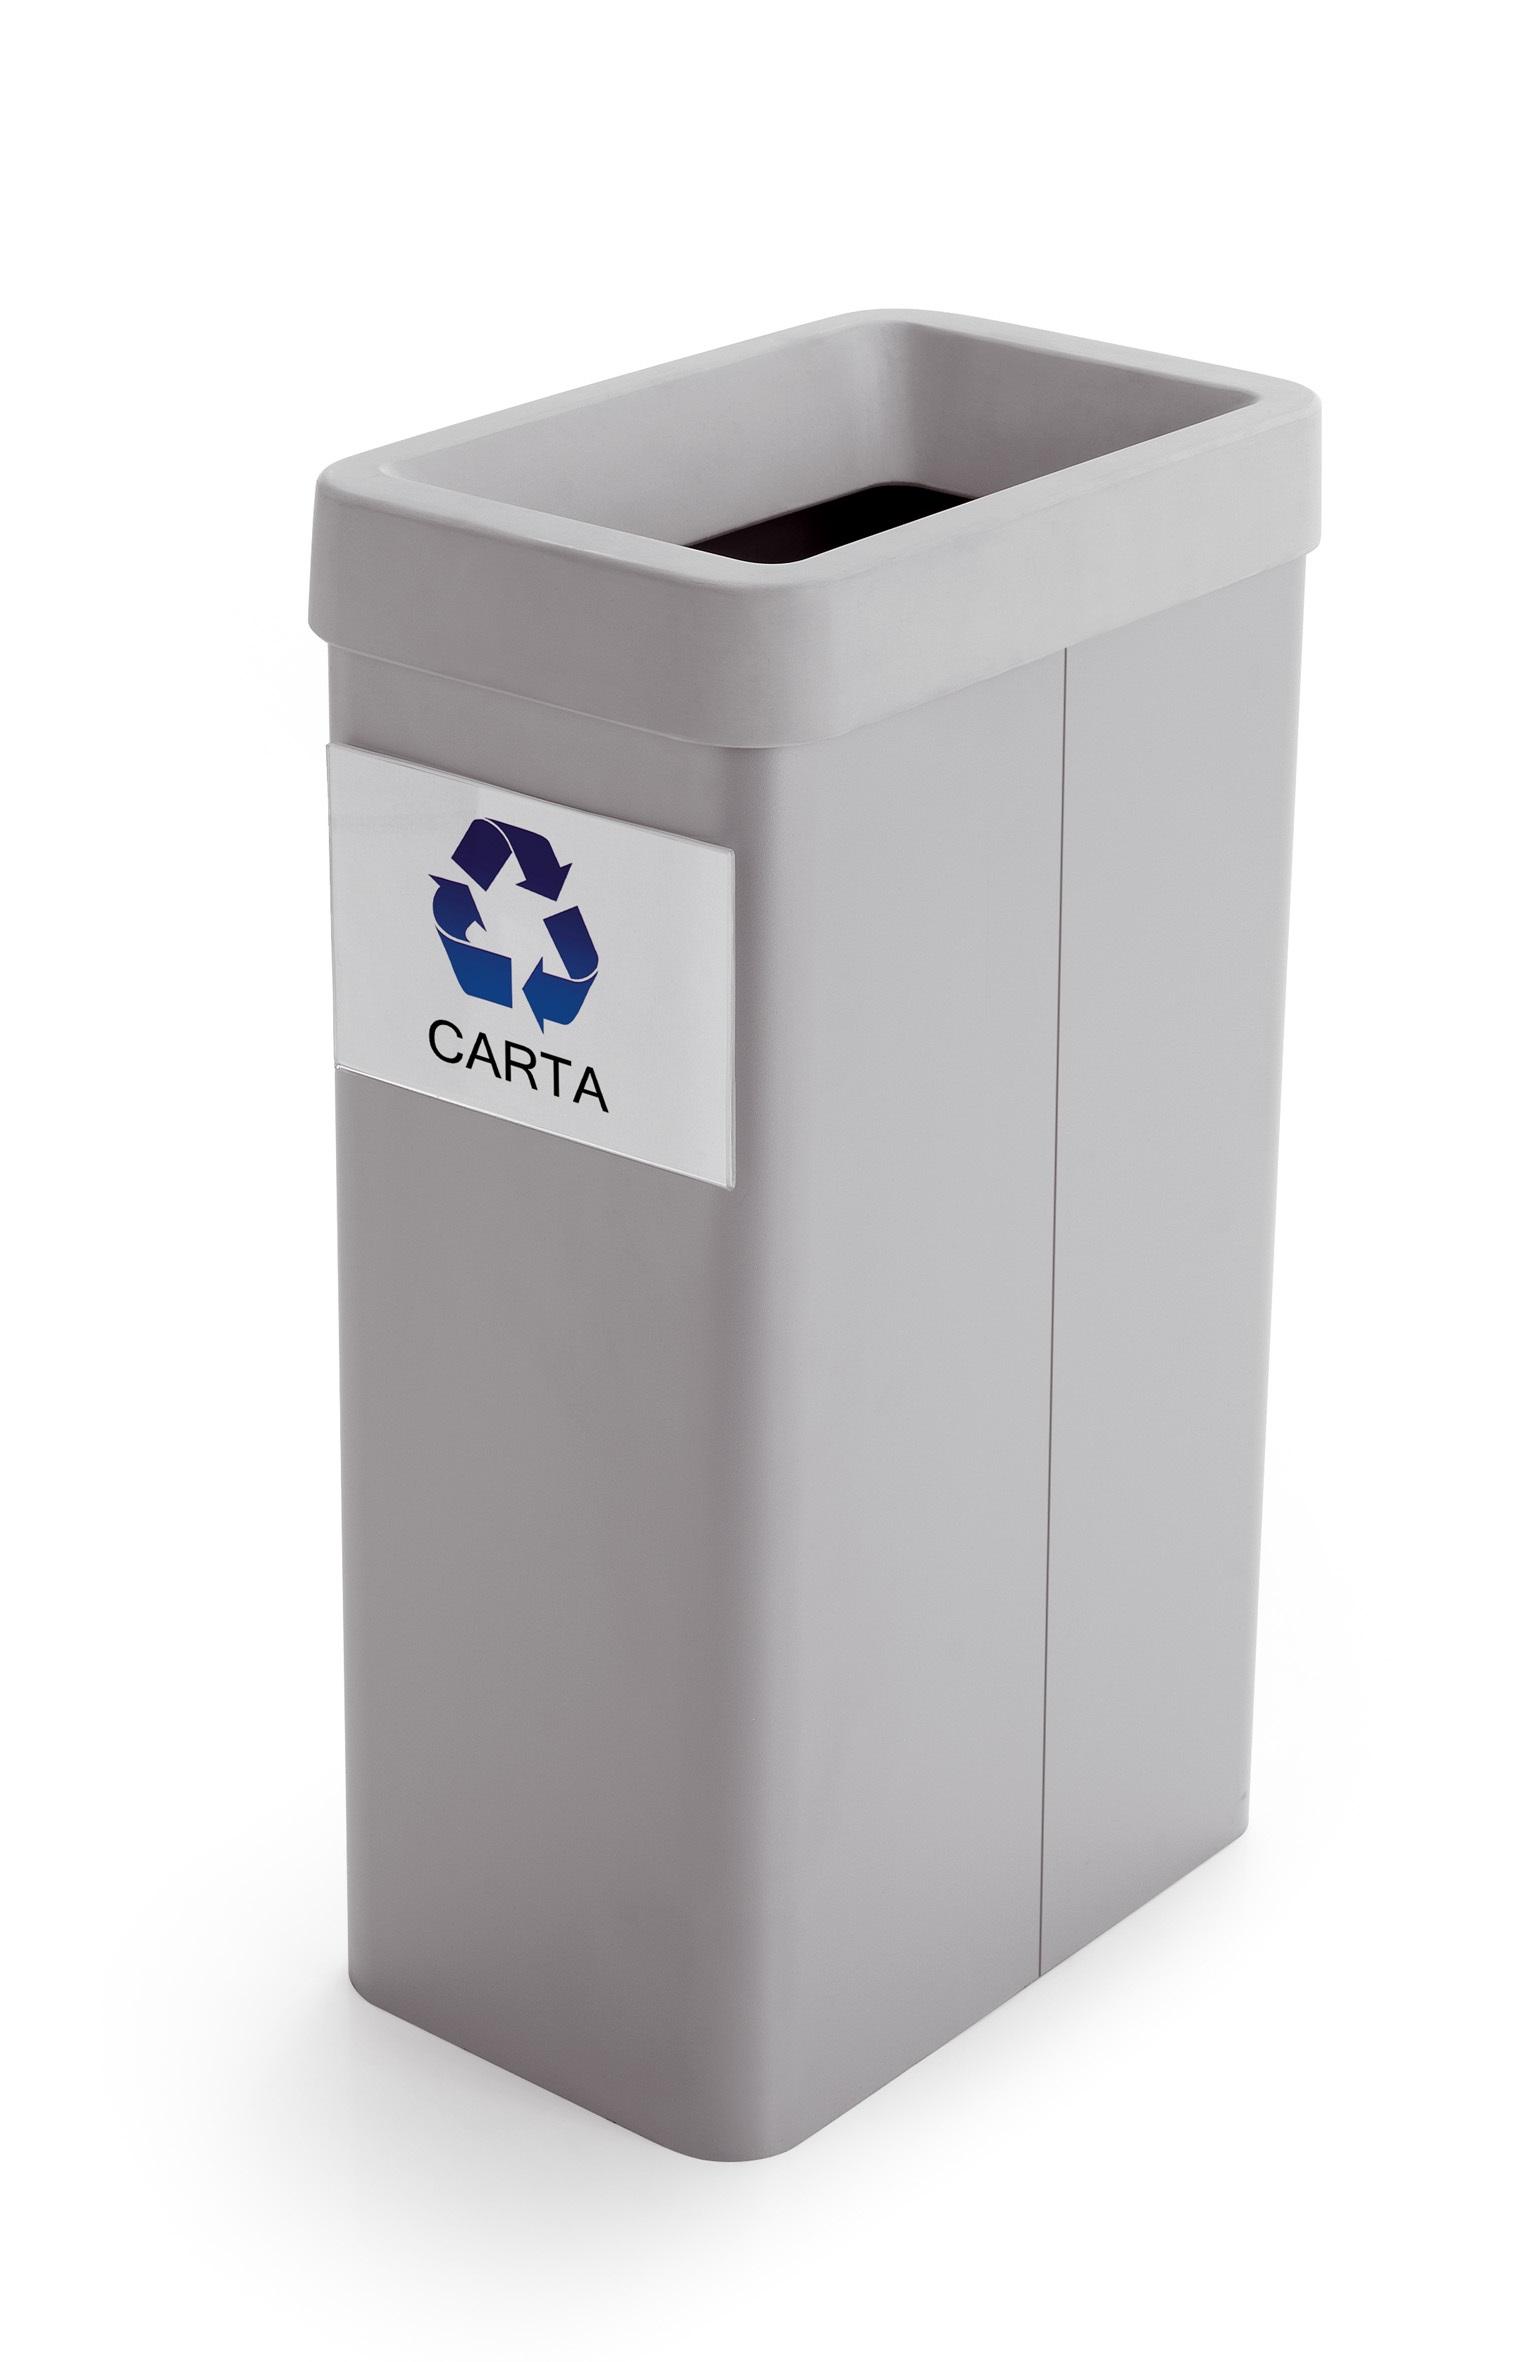 Office Recycling Bins Uk. Office Bins UK. Metal Recycling Bins